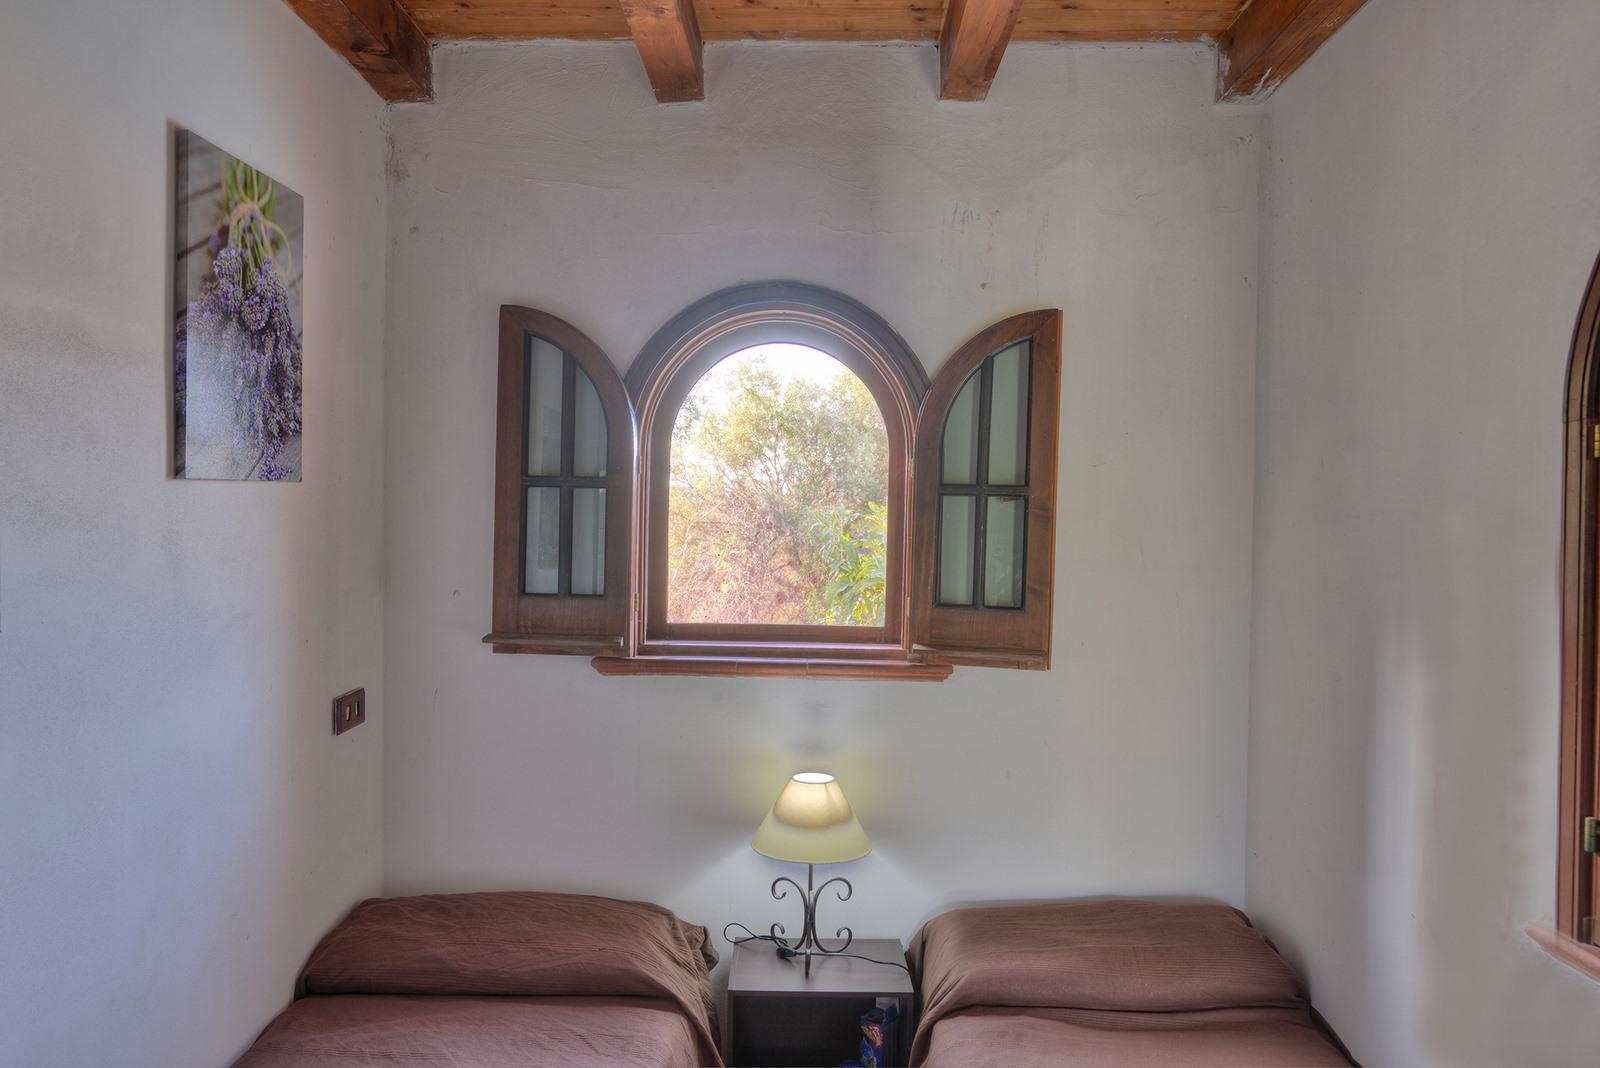 Maison de vacances Villa Casa (1531407), Solarino, Siracusa, Sicile, Italie, image 12